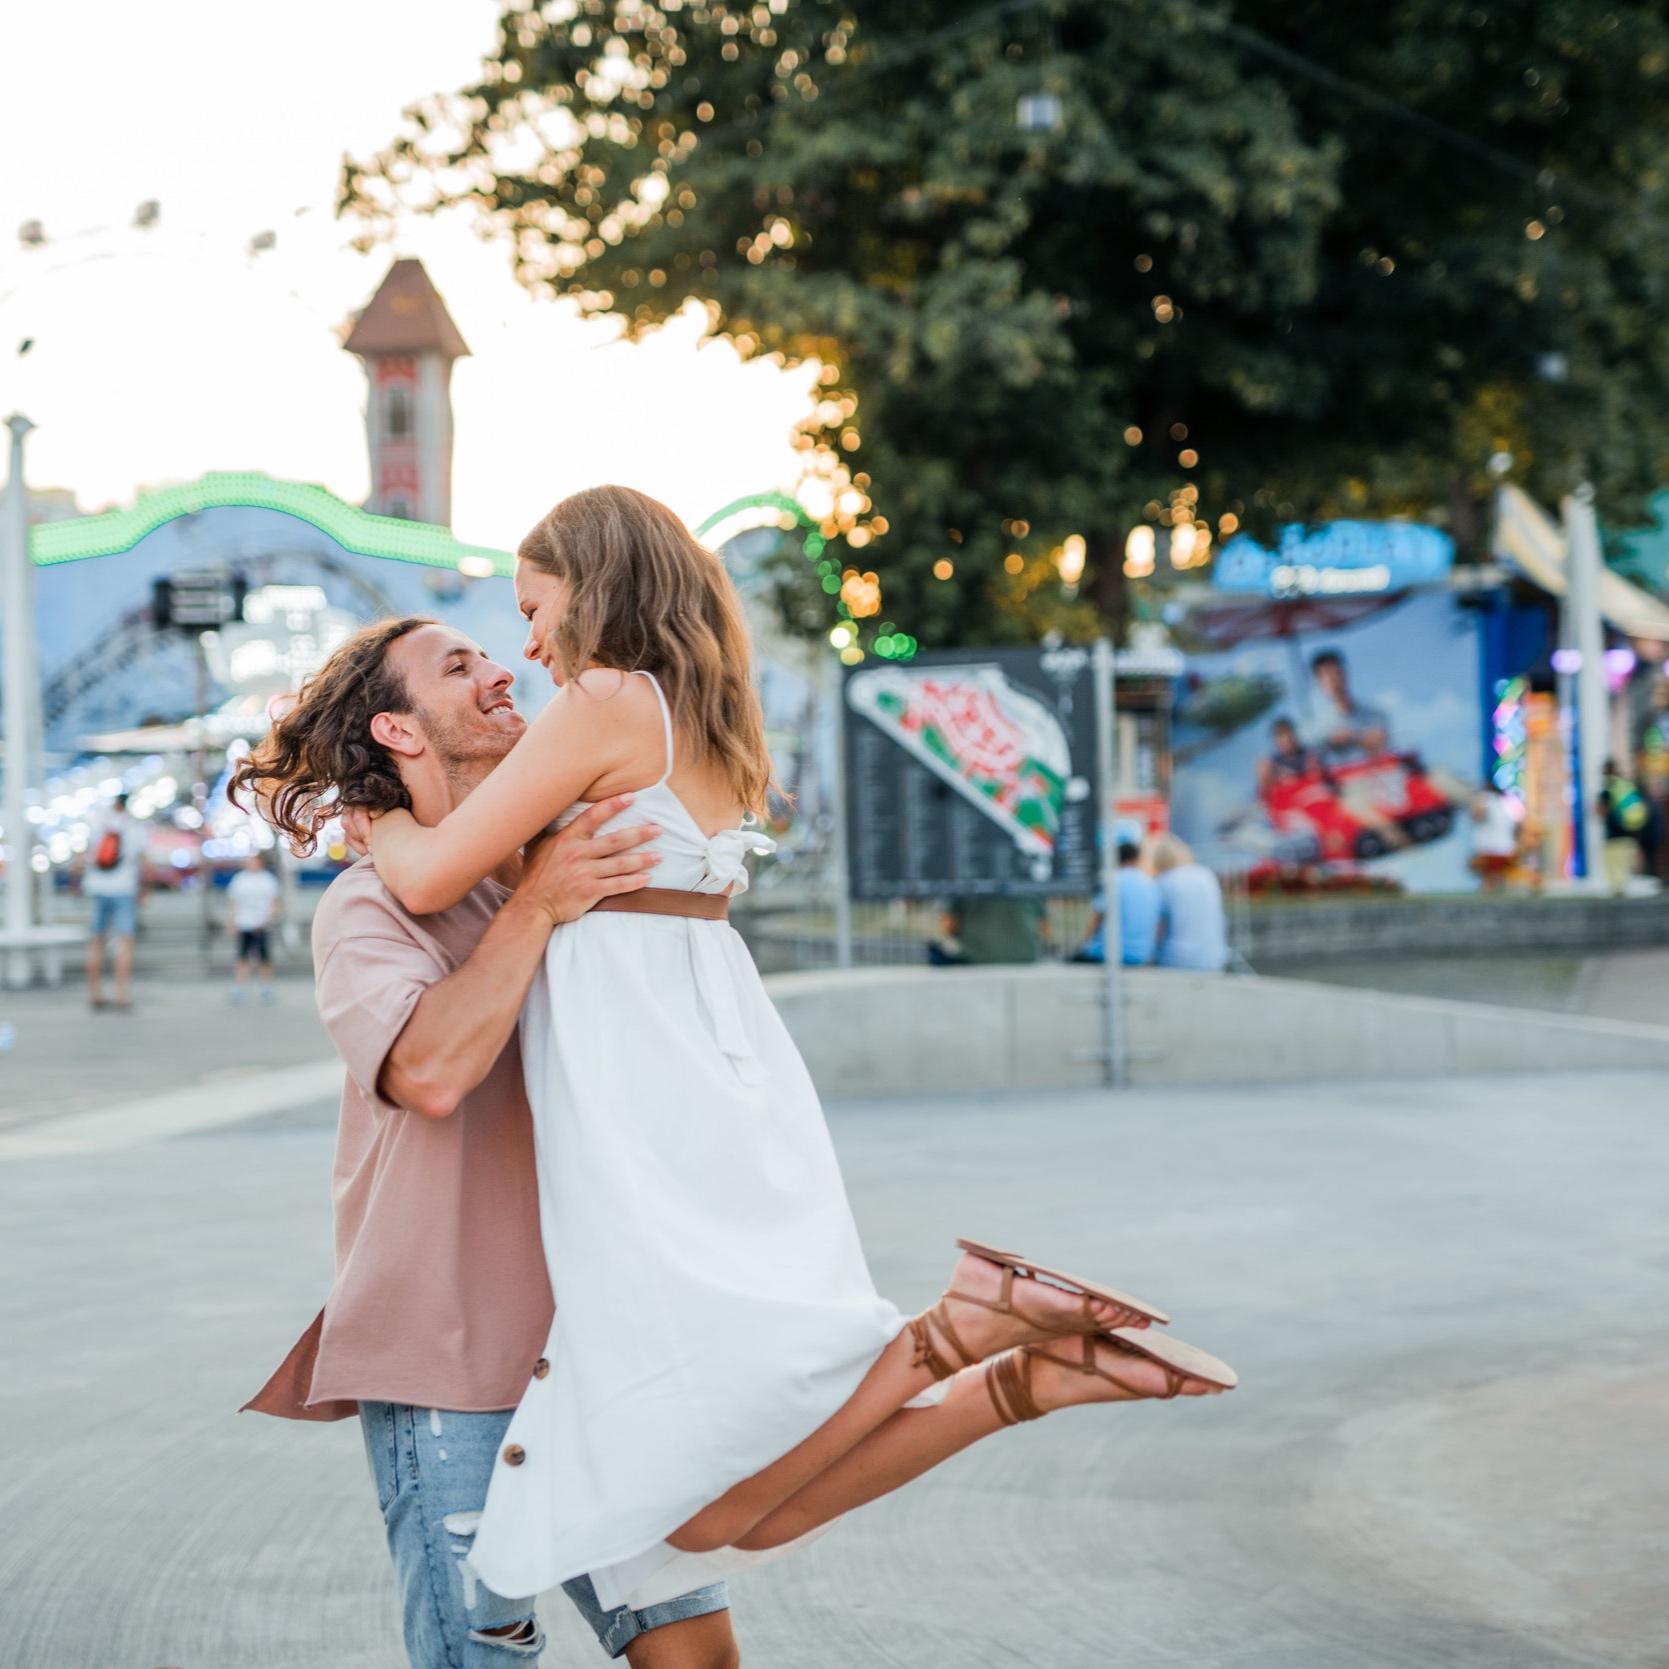 Verlobungsshooting im Prater